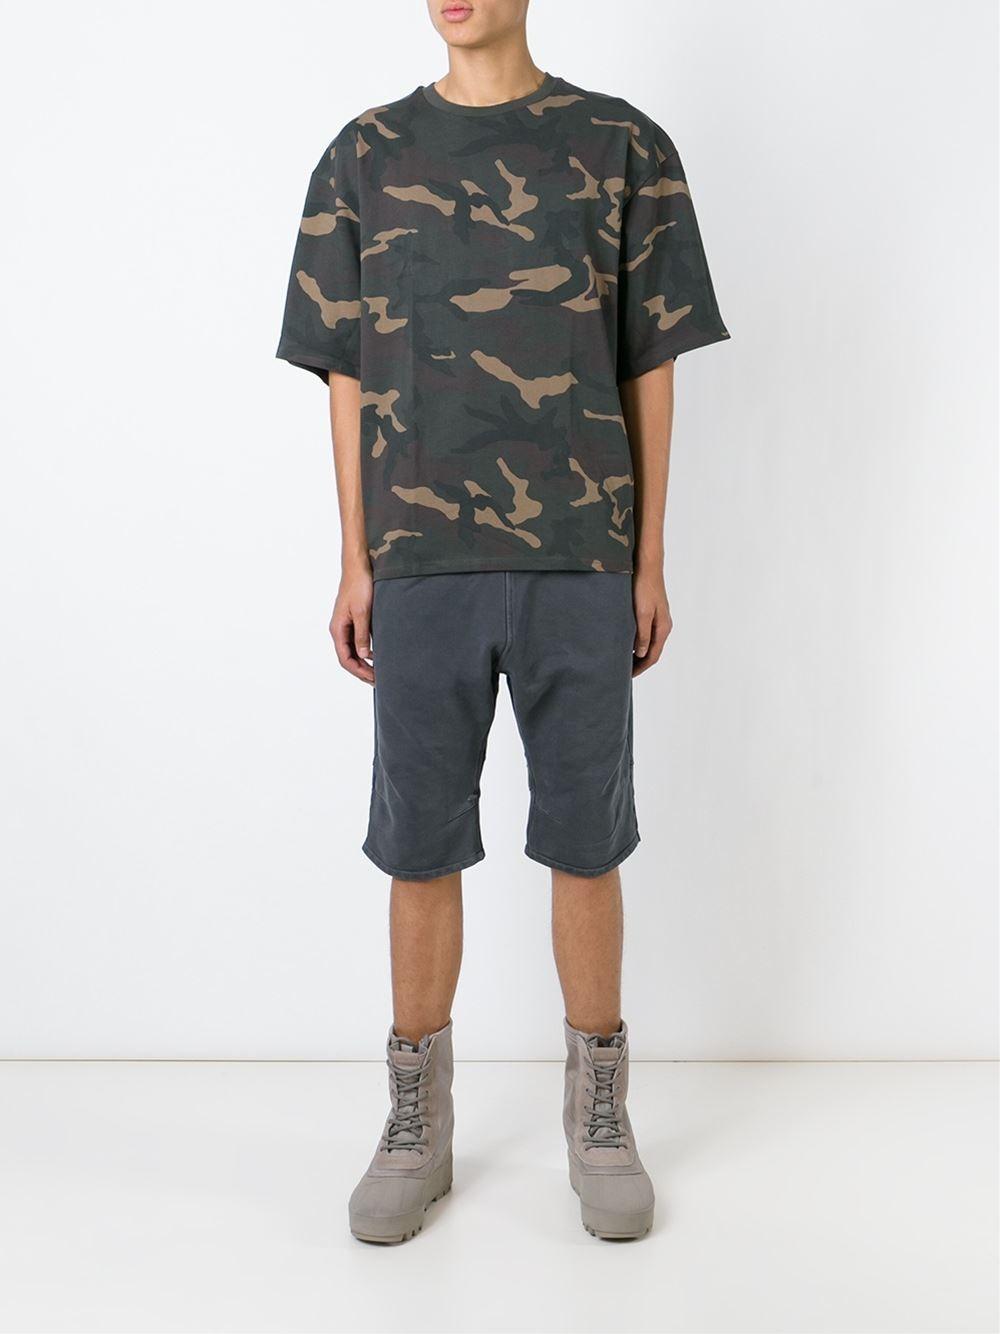 lyst yeezy adidas originals by kanye west track shorts